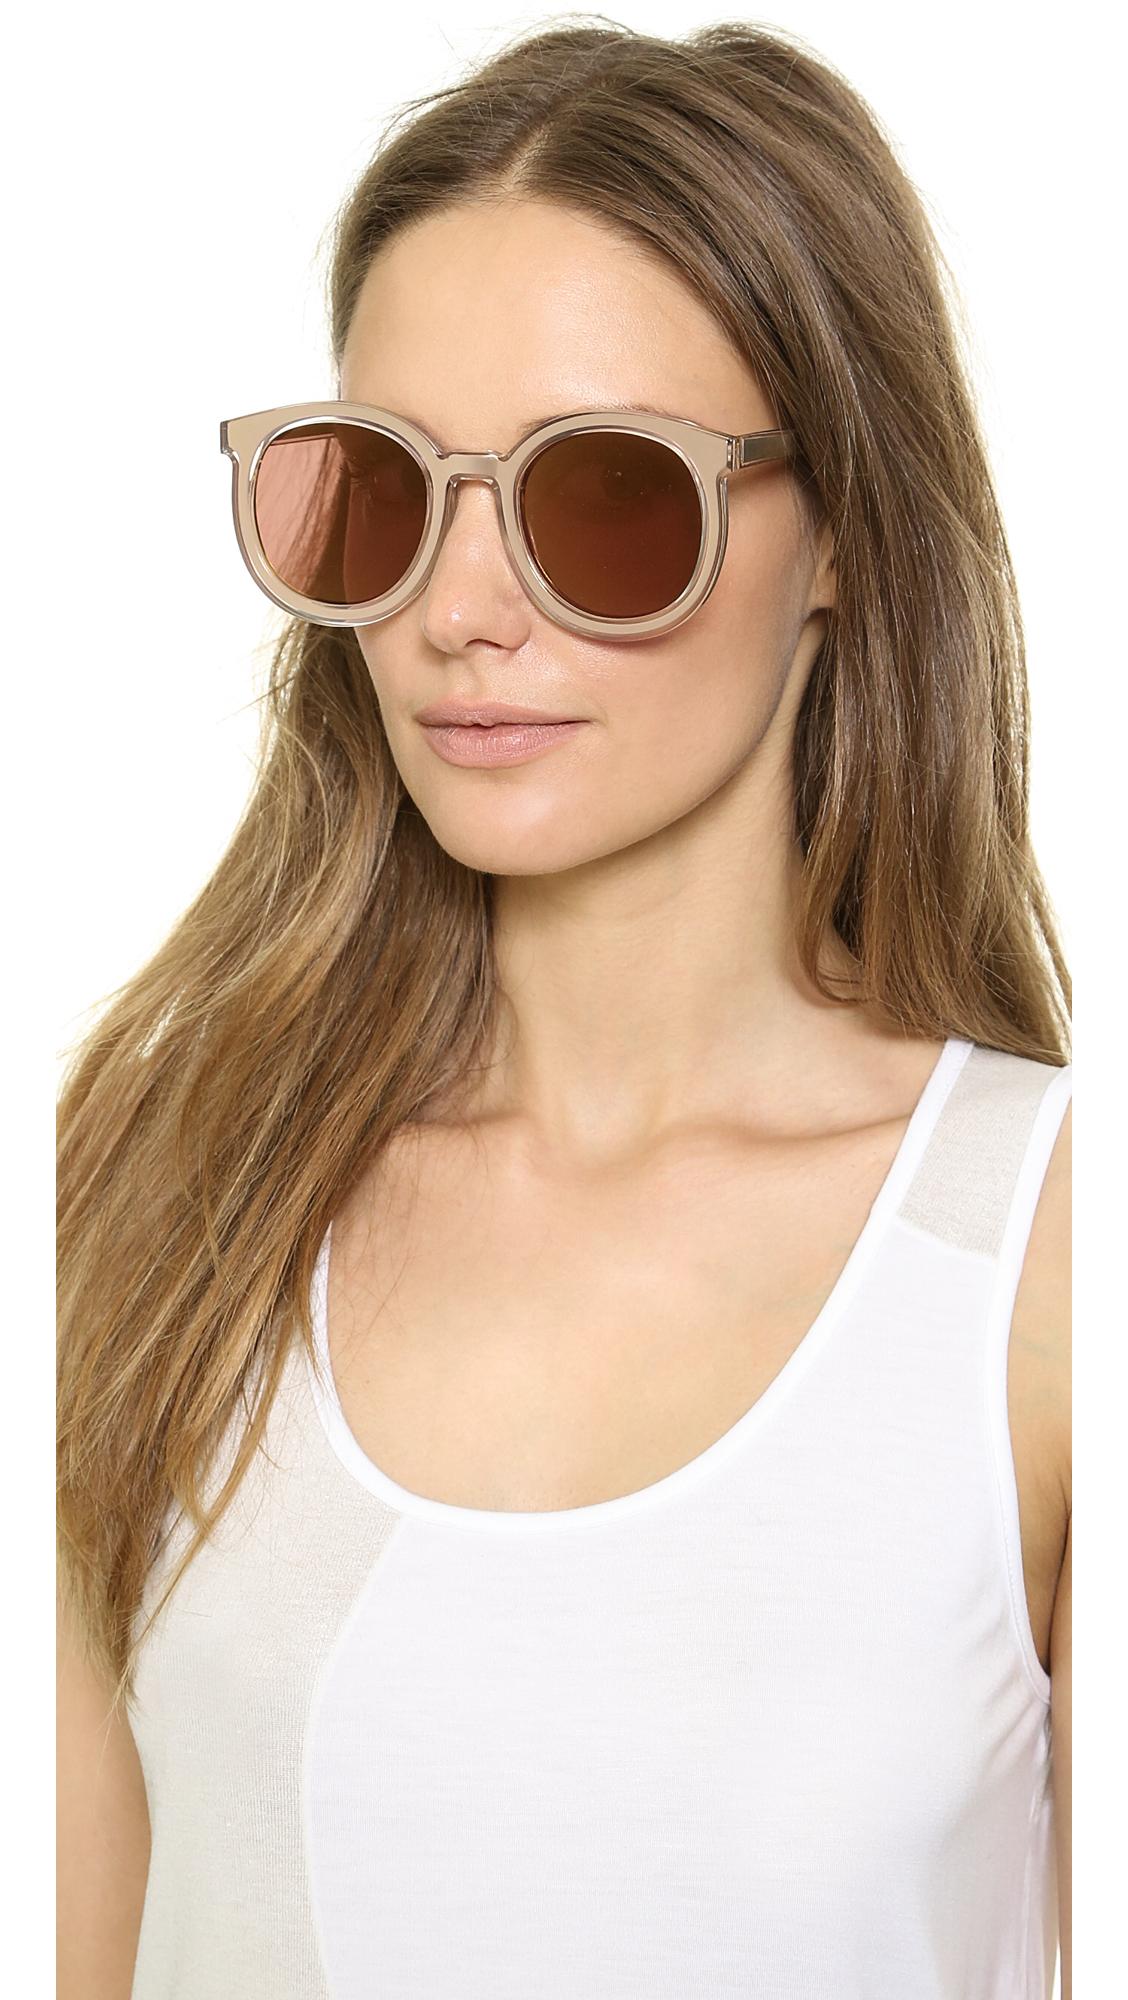 80b60799106b9 Karen Walker Super Duper Mirrored Sunglasses - Goldgold Flash Mirror in  Metallic - Lyst